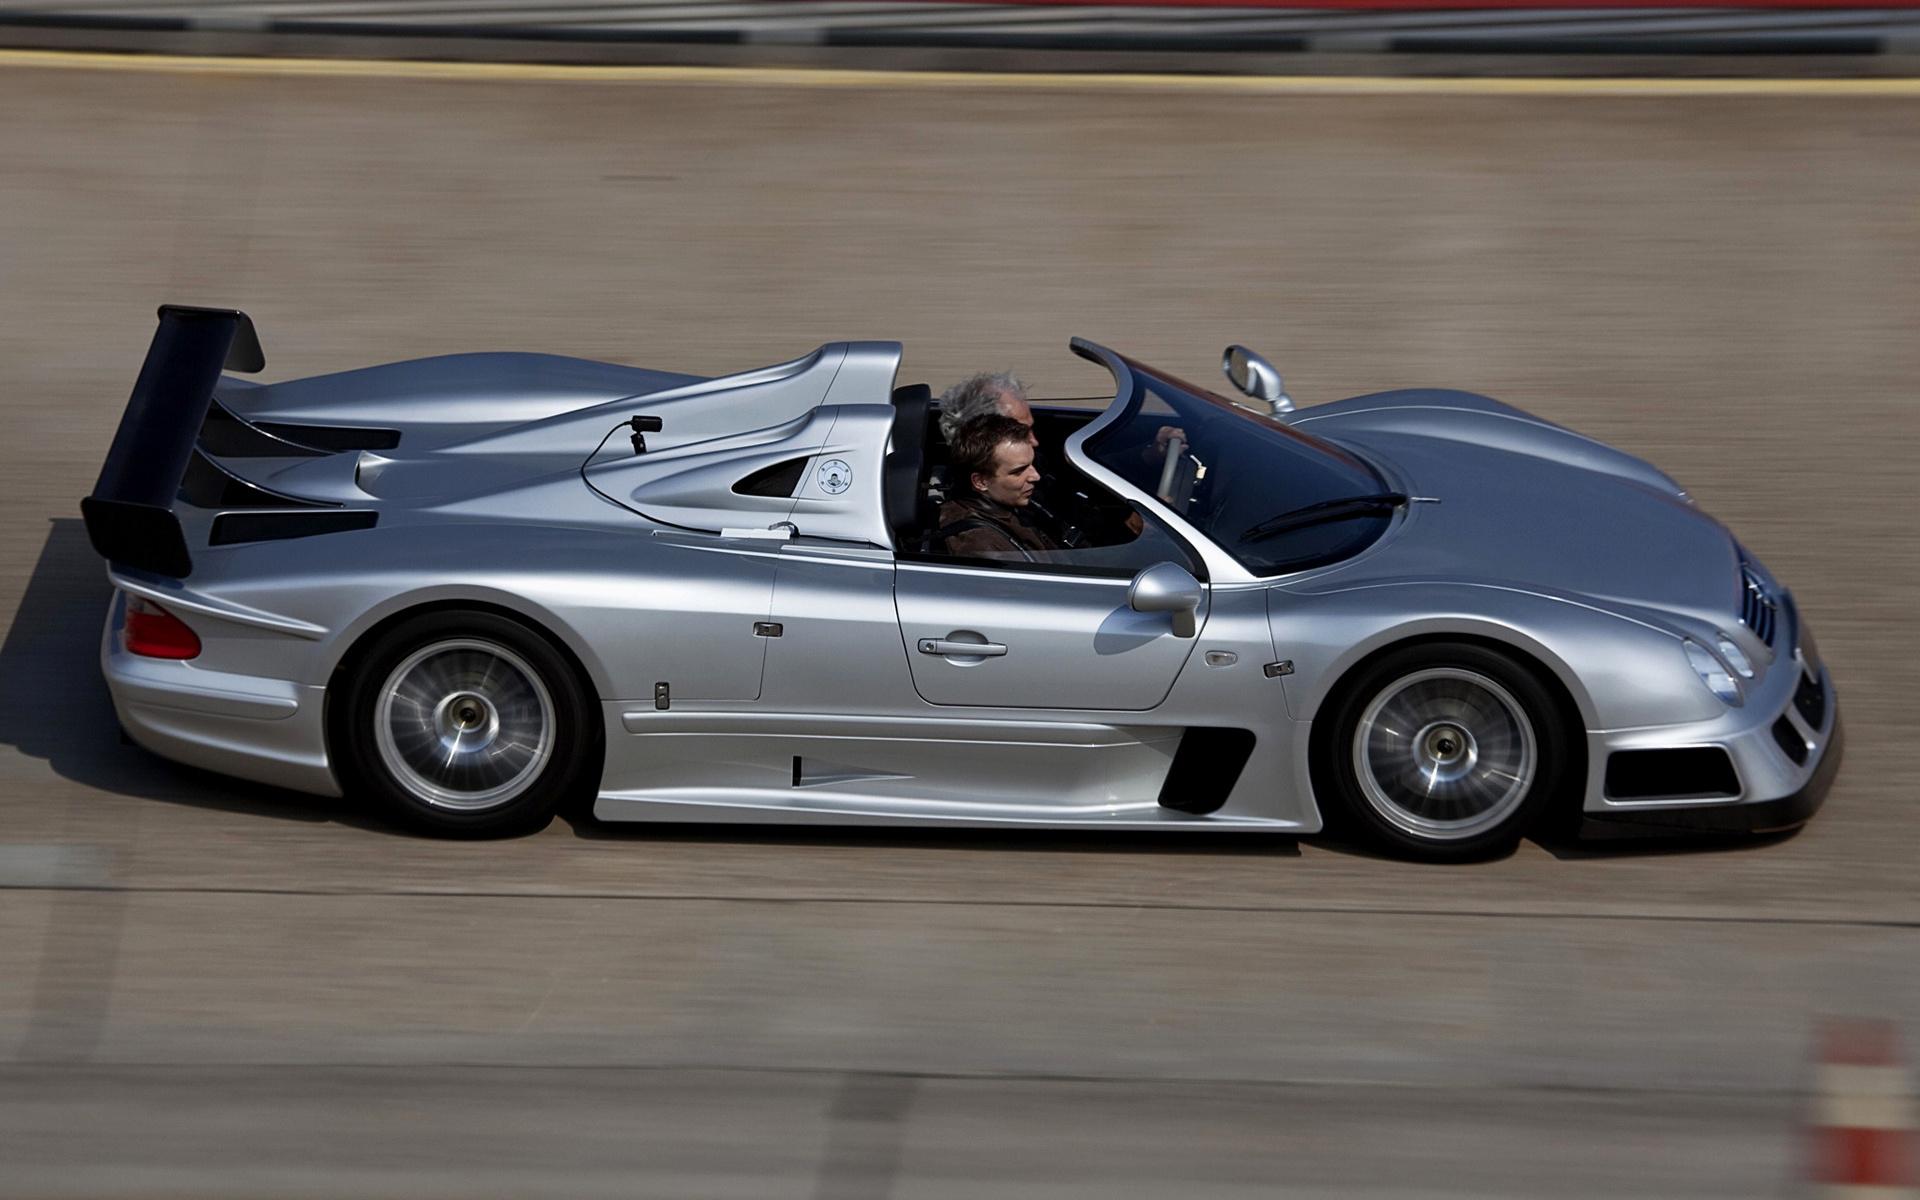 Mercedes-Benz CLK GTR Roadster (1998) Wallpapers and HD ...